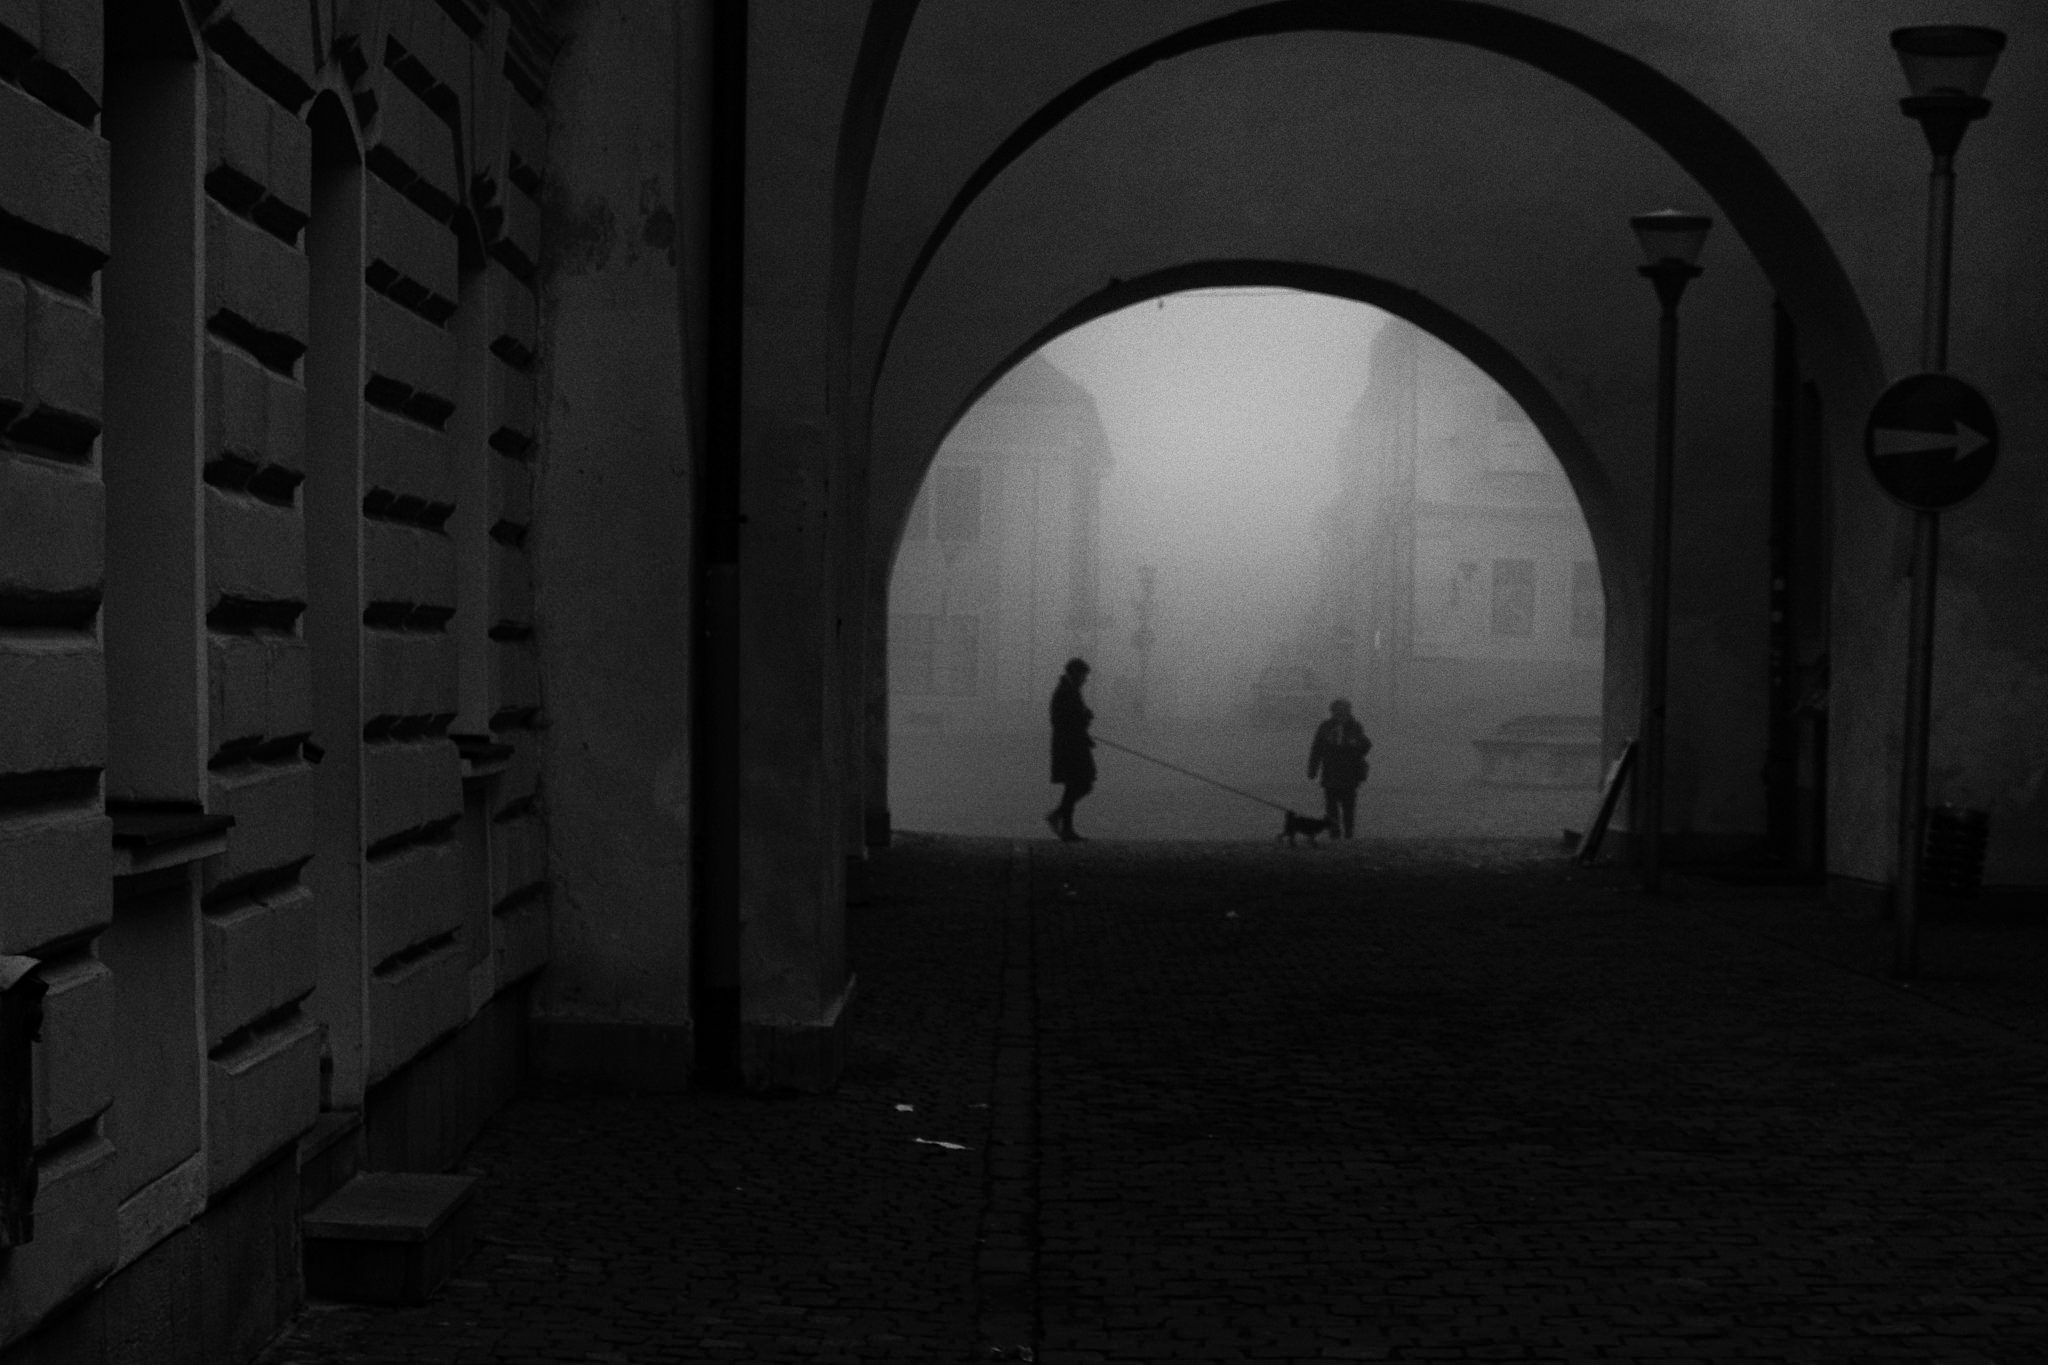 Morning walk by miroslavpolca